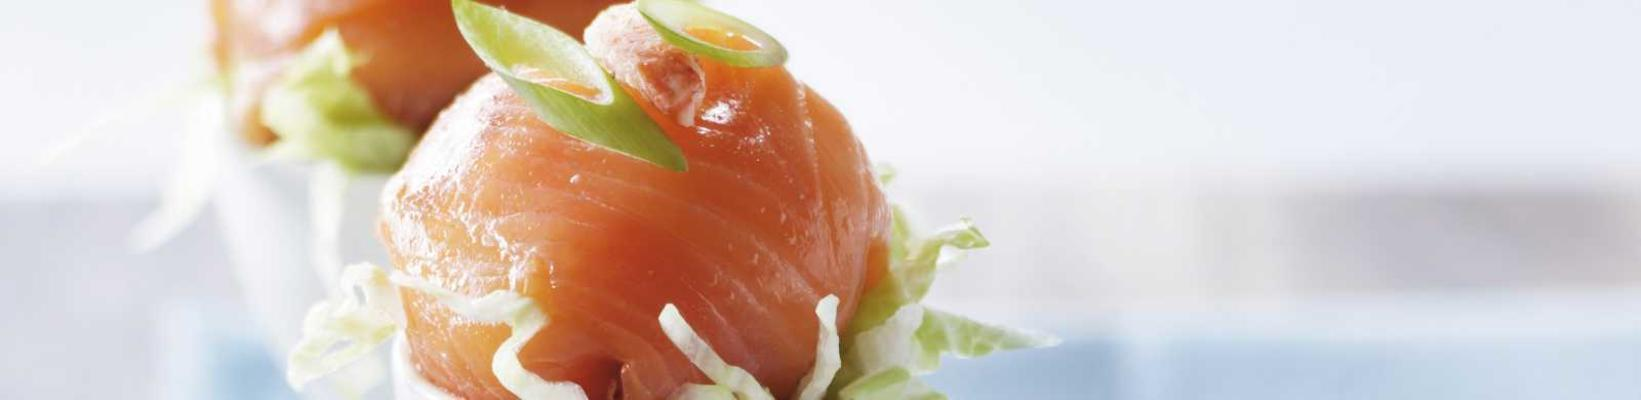 egg cup salmon-amuse